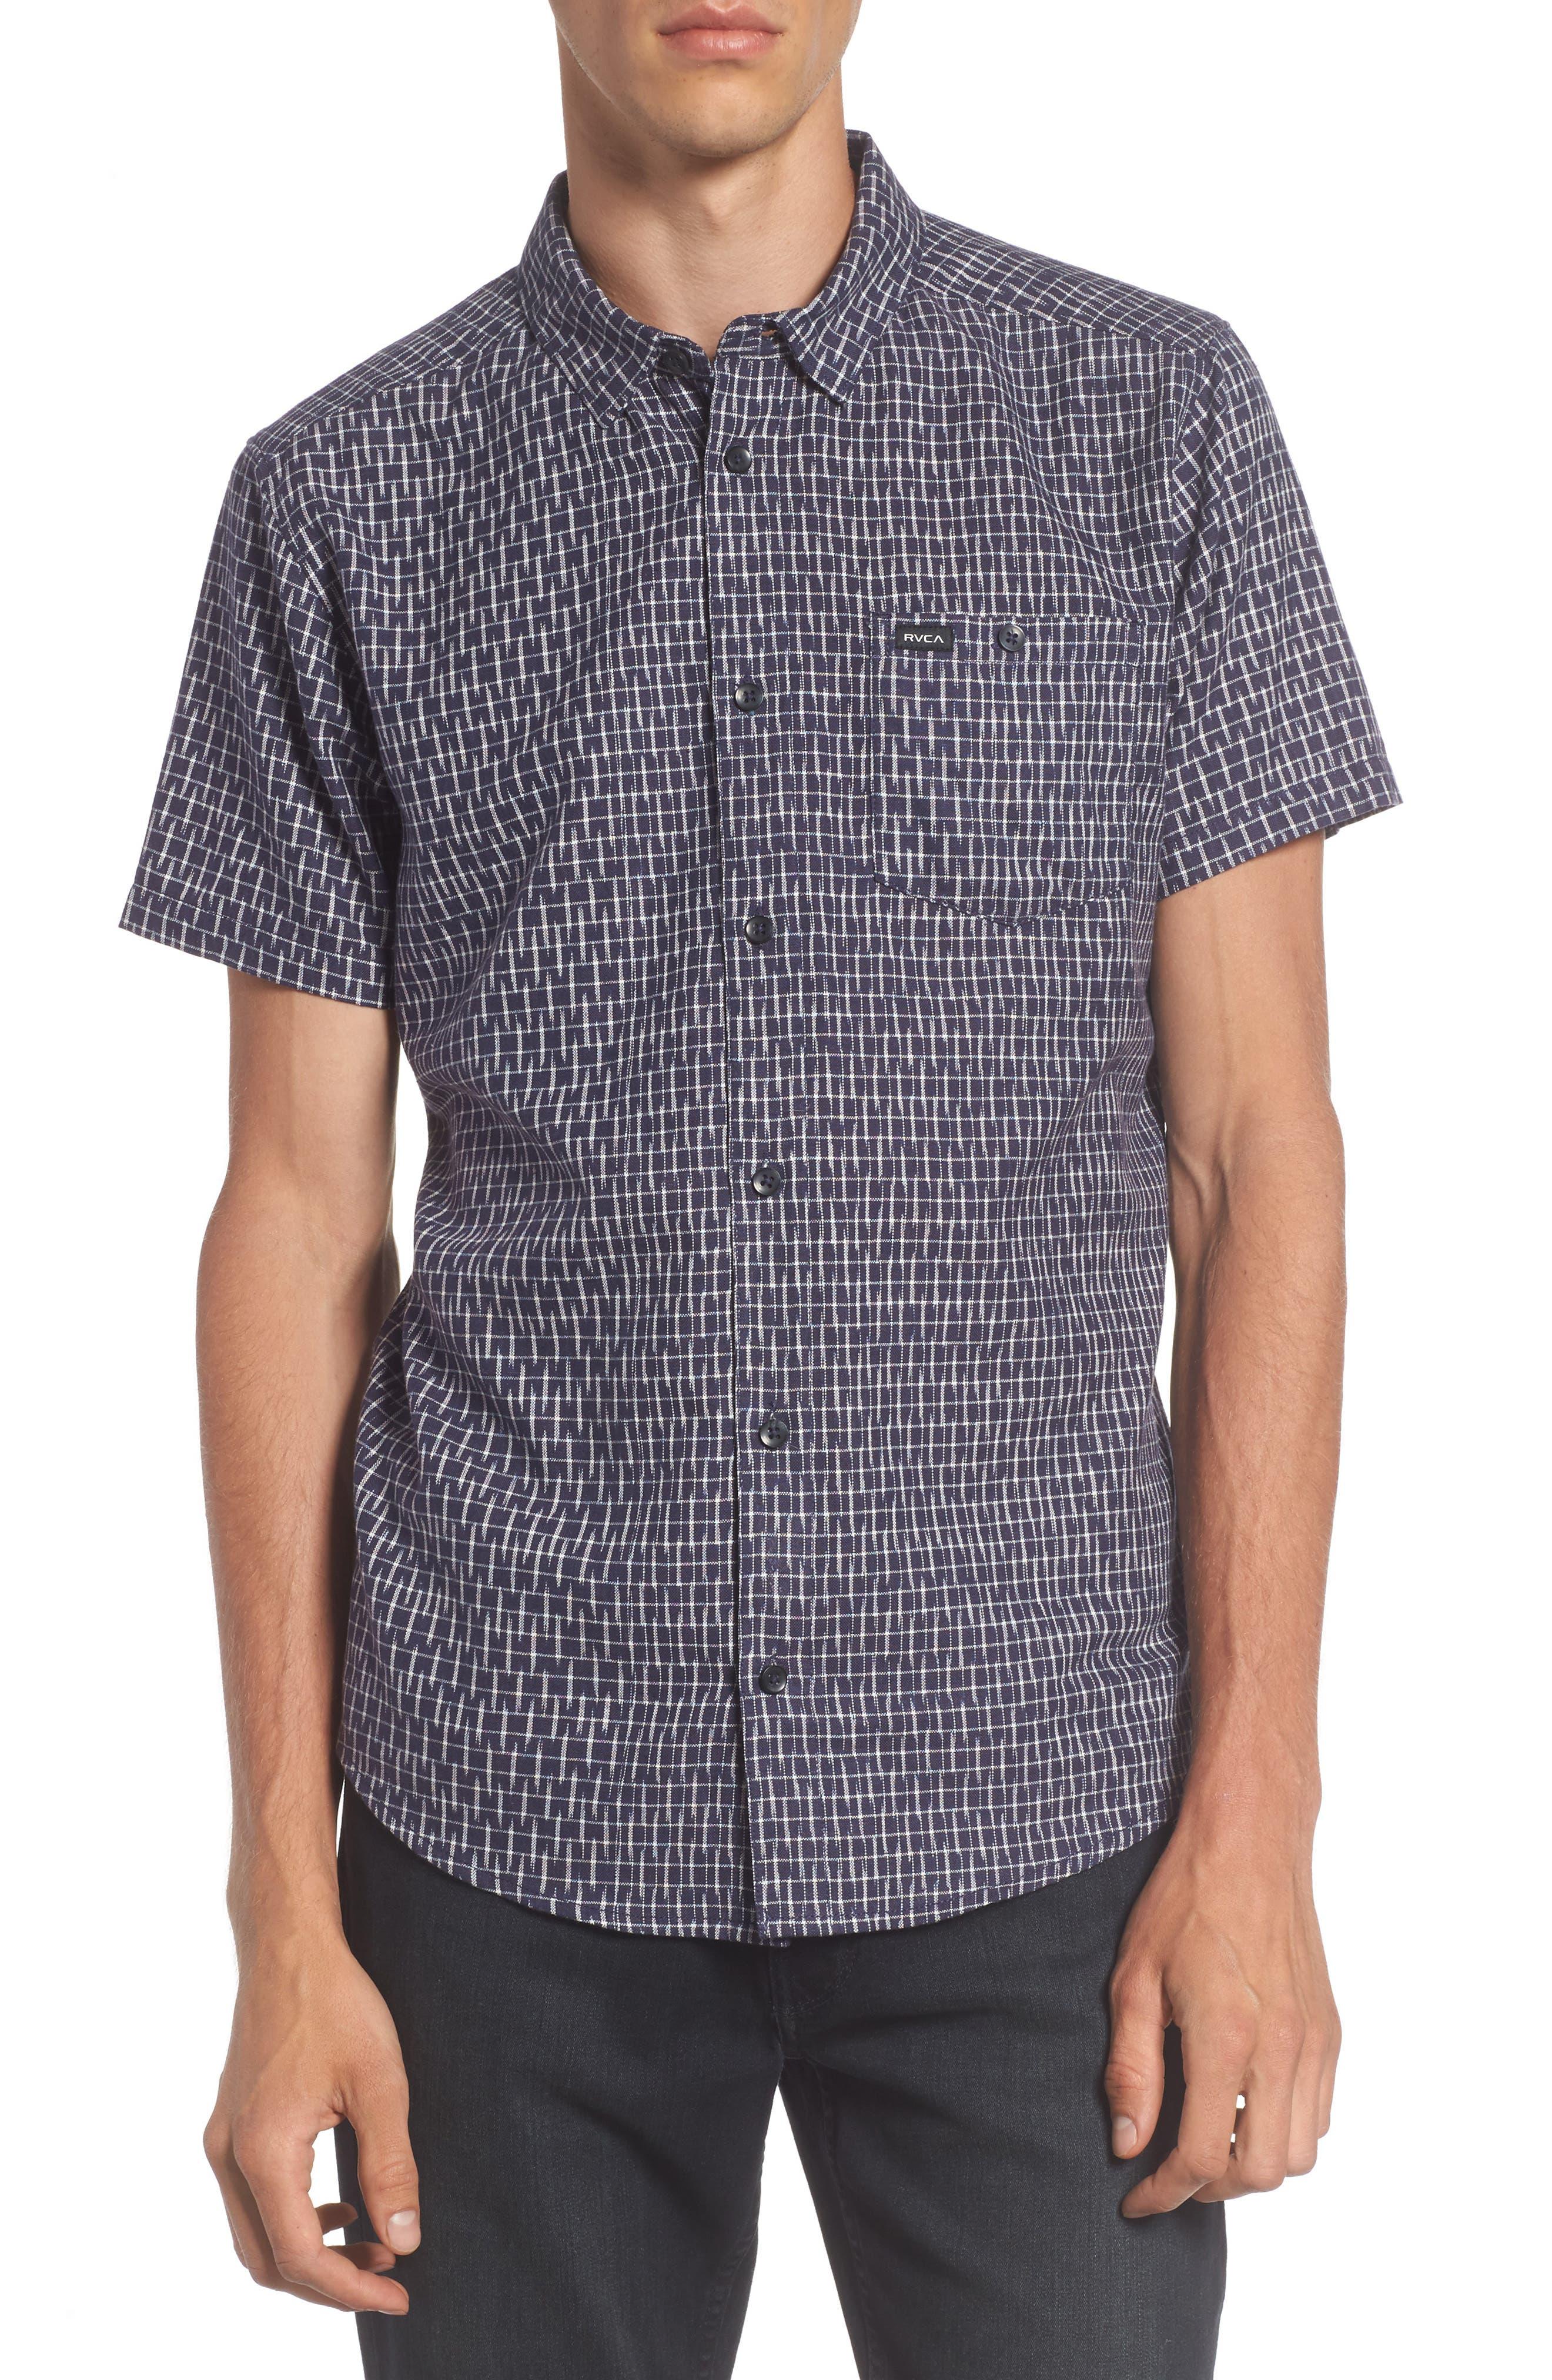 Fontana Print Woven Shirt,                         Main,                         color, Multi